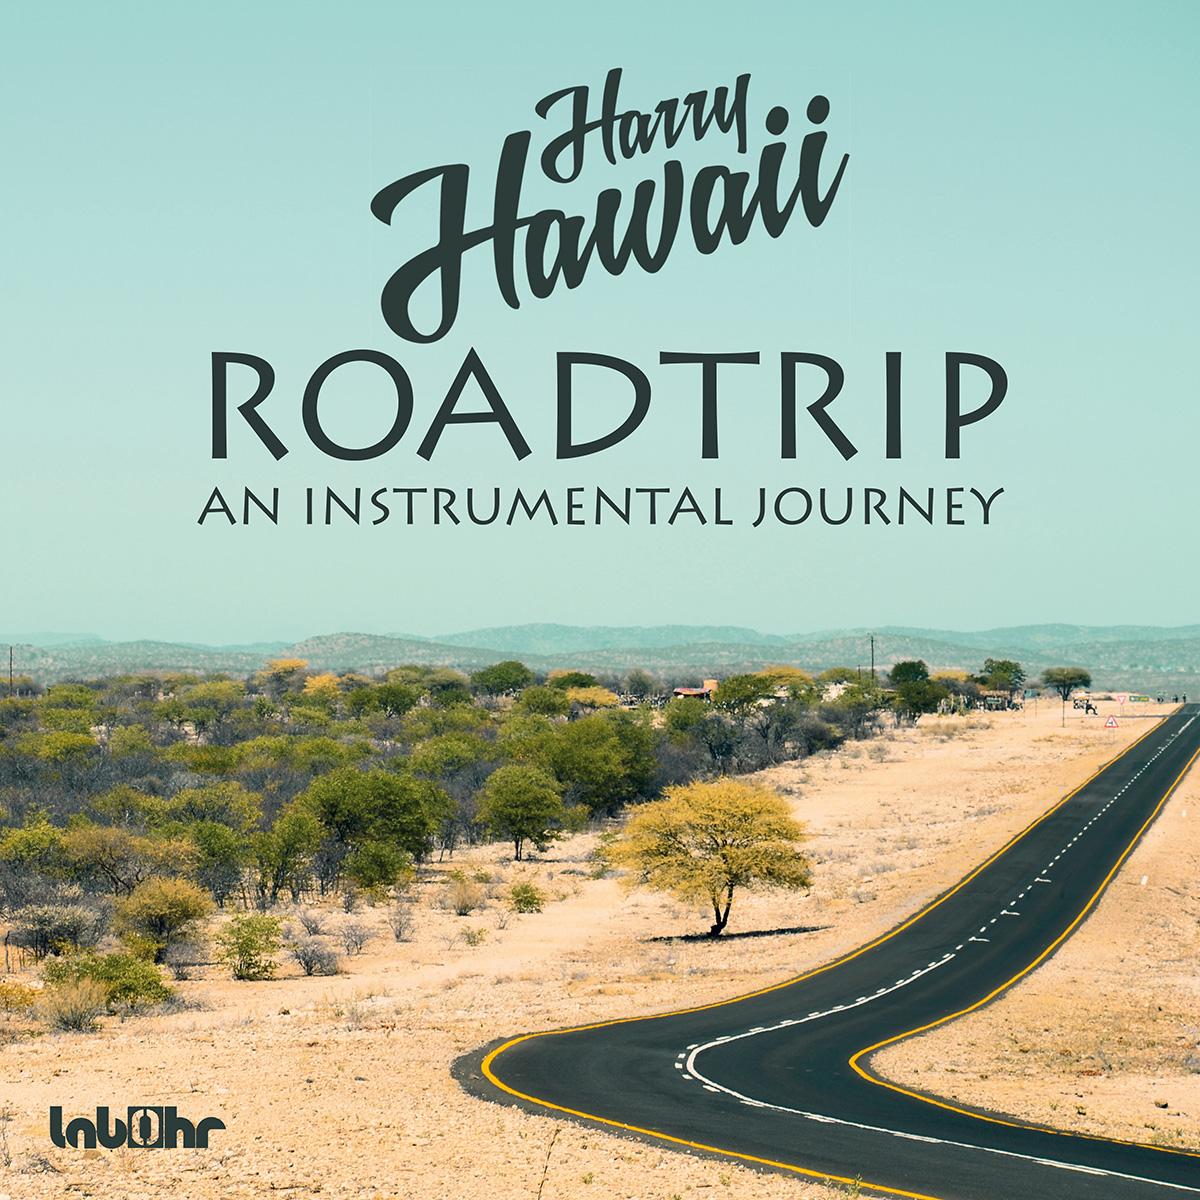 roadtrip_harry_hawaii_COVER